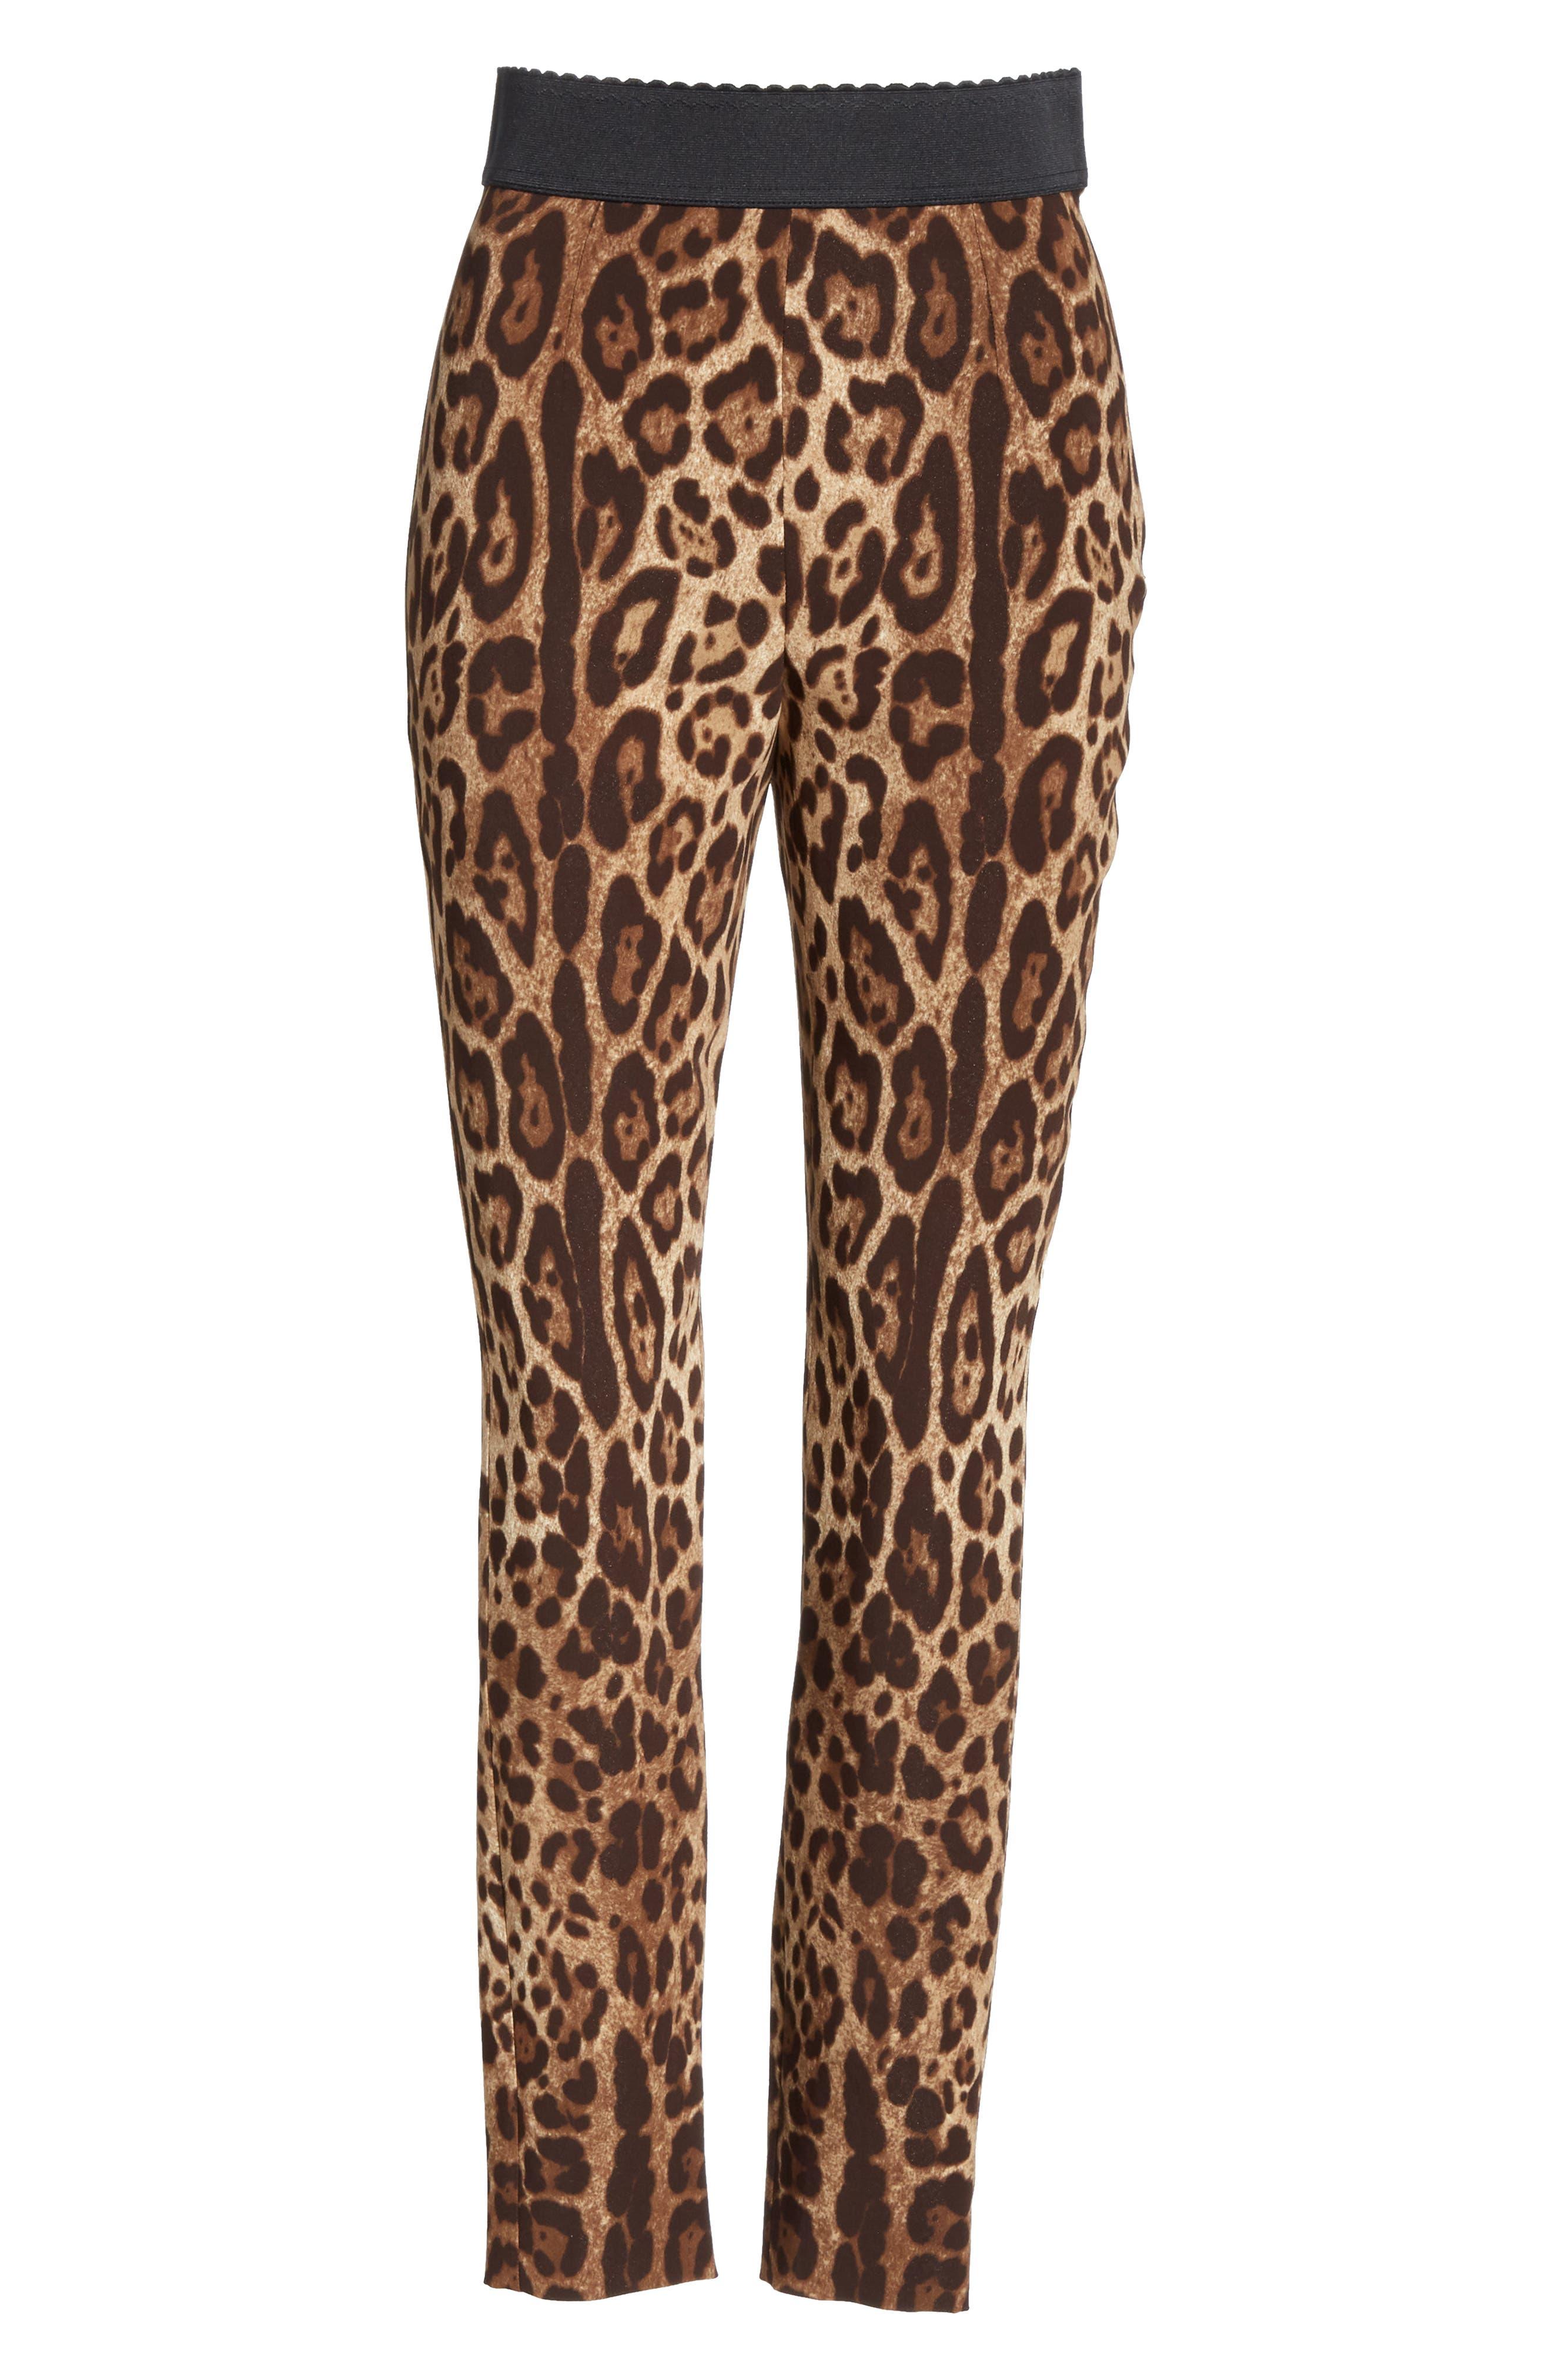 DOLCE&GABBANA, Leopard Print Cady Leggings, Alternate thumbnail 6, color, LEO